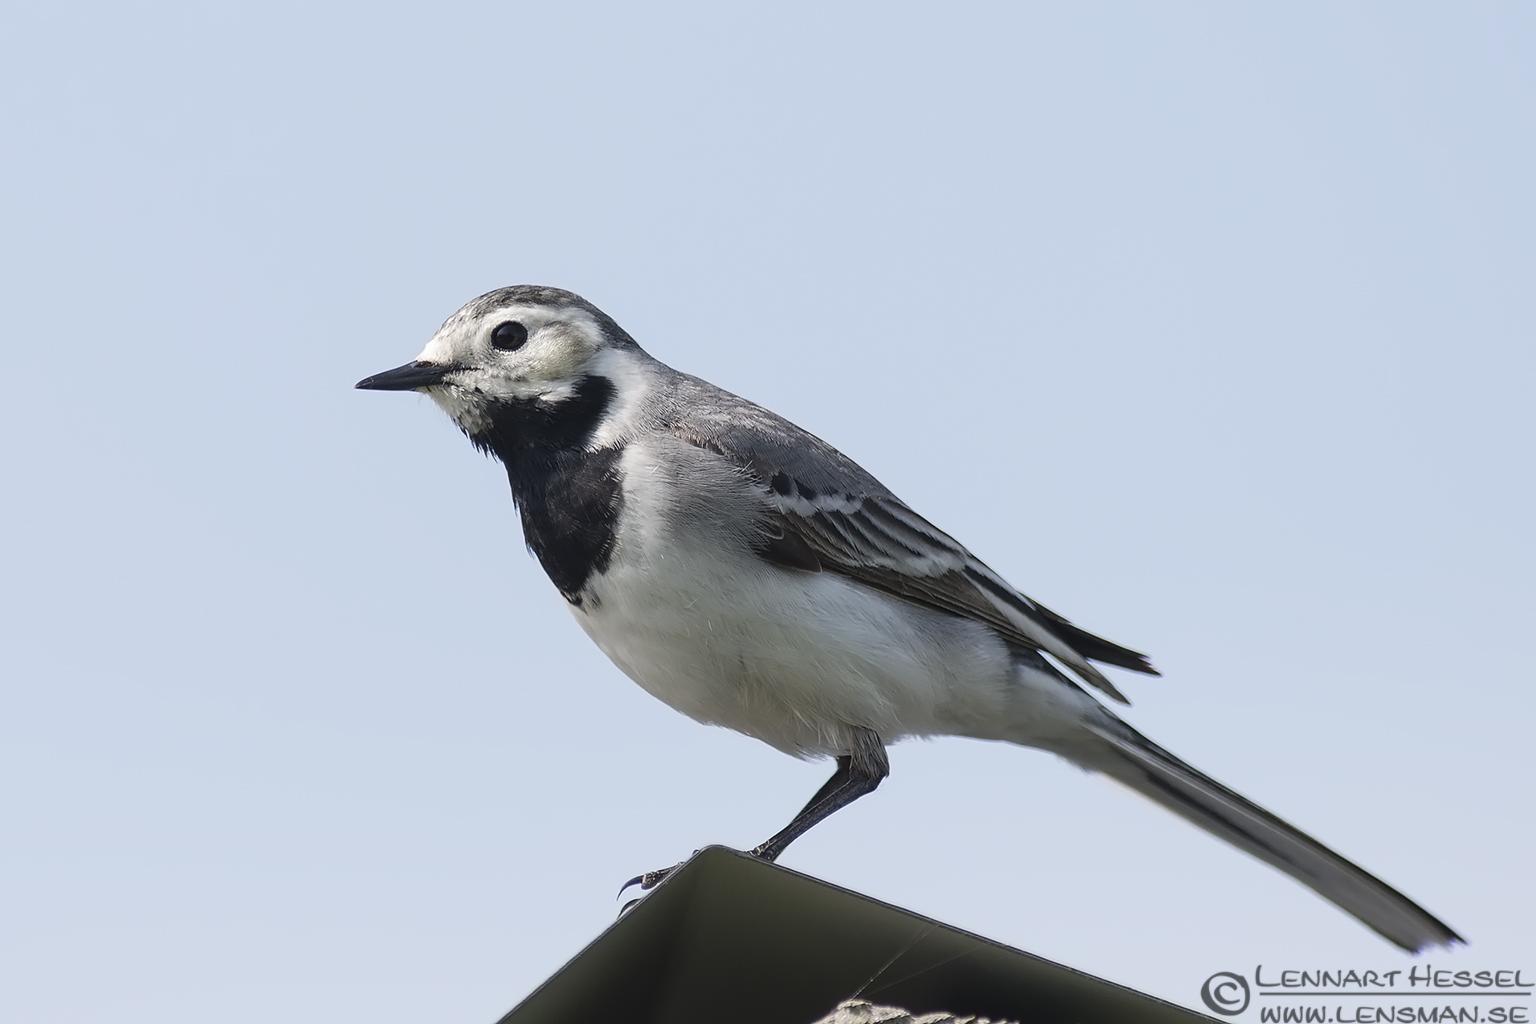 White Wagtail nightingale